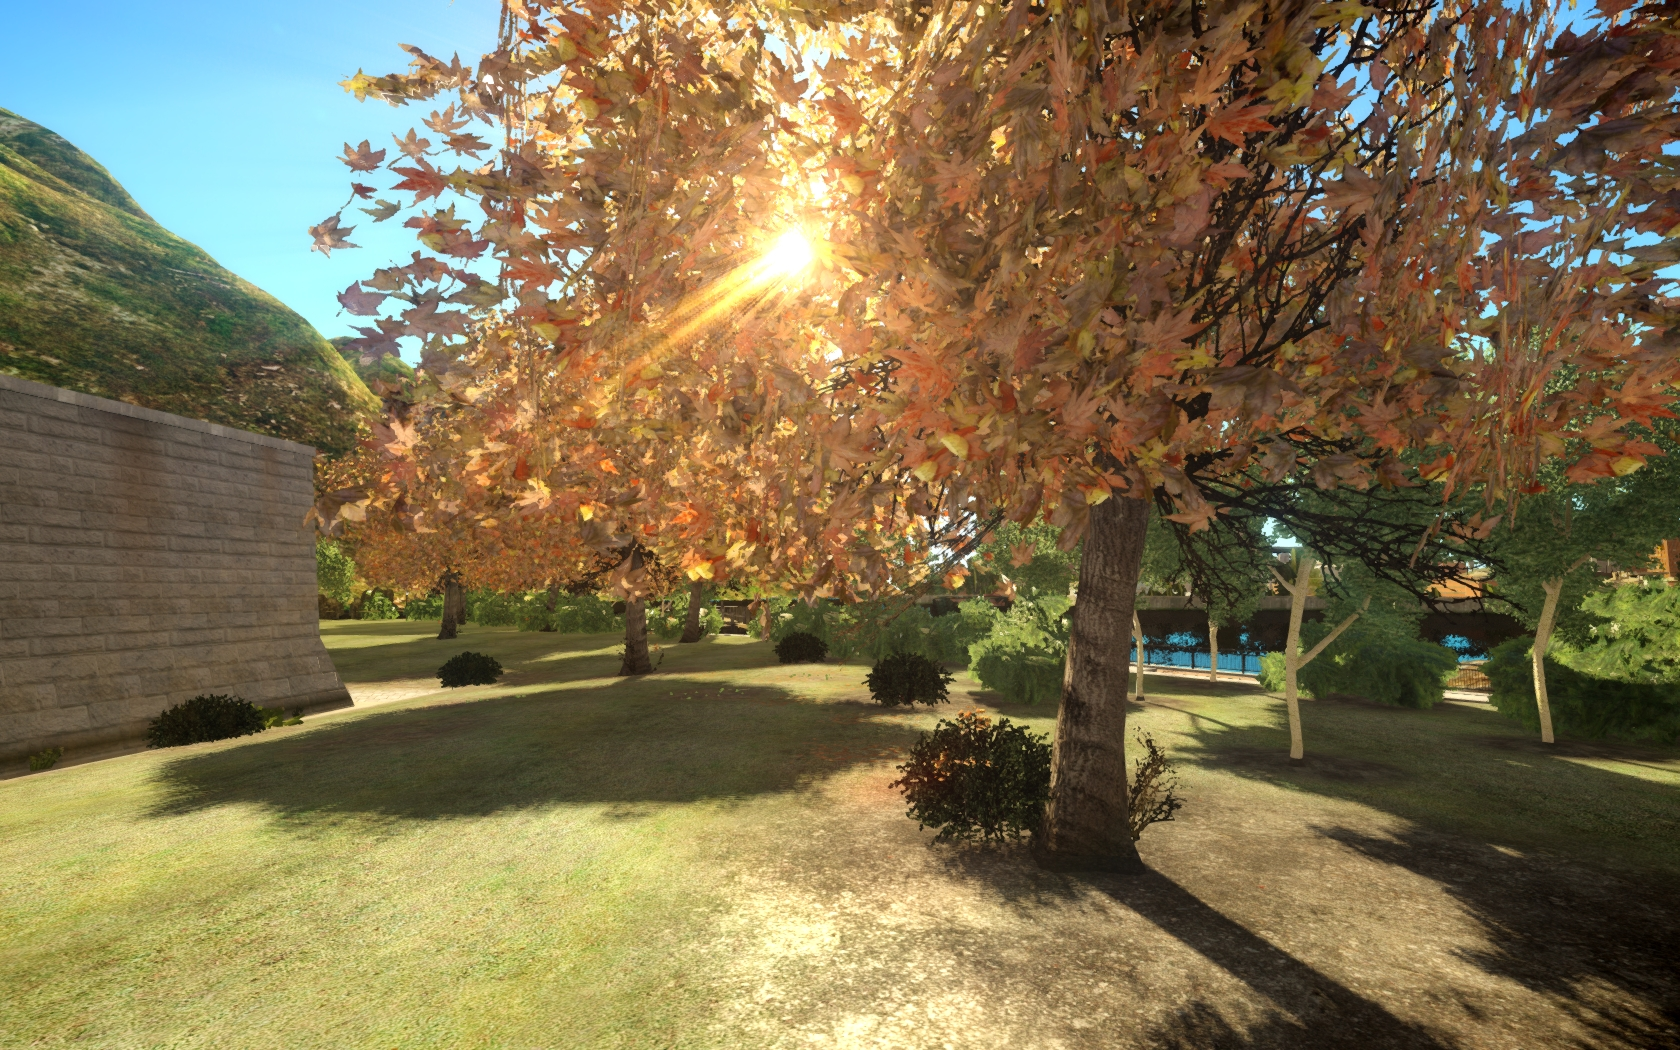 gta 4 trees mod by dkt70